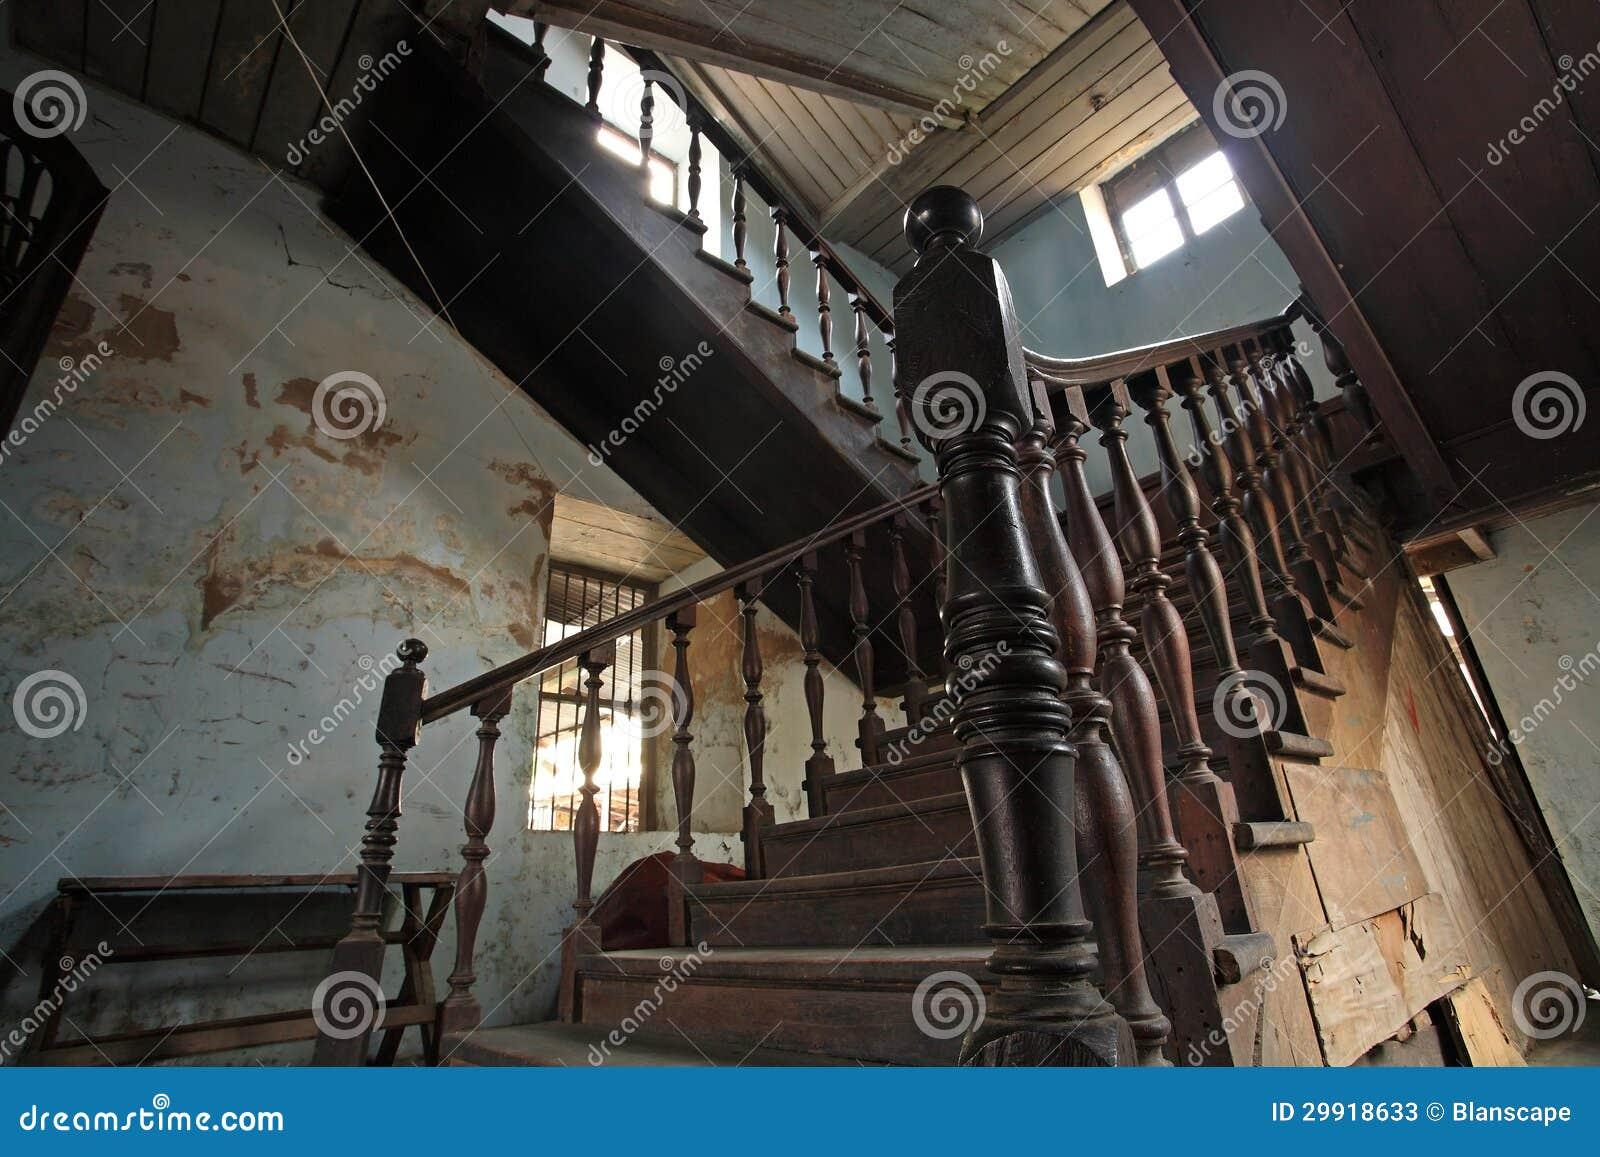 Escaleras de madera antiguas interiores imagen de archivo - Escaleras antiguas de madera ...